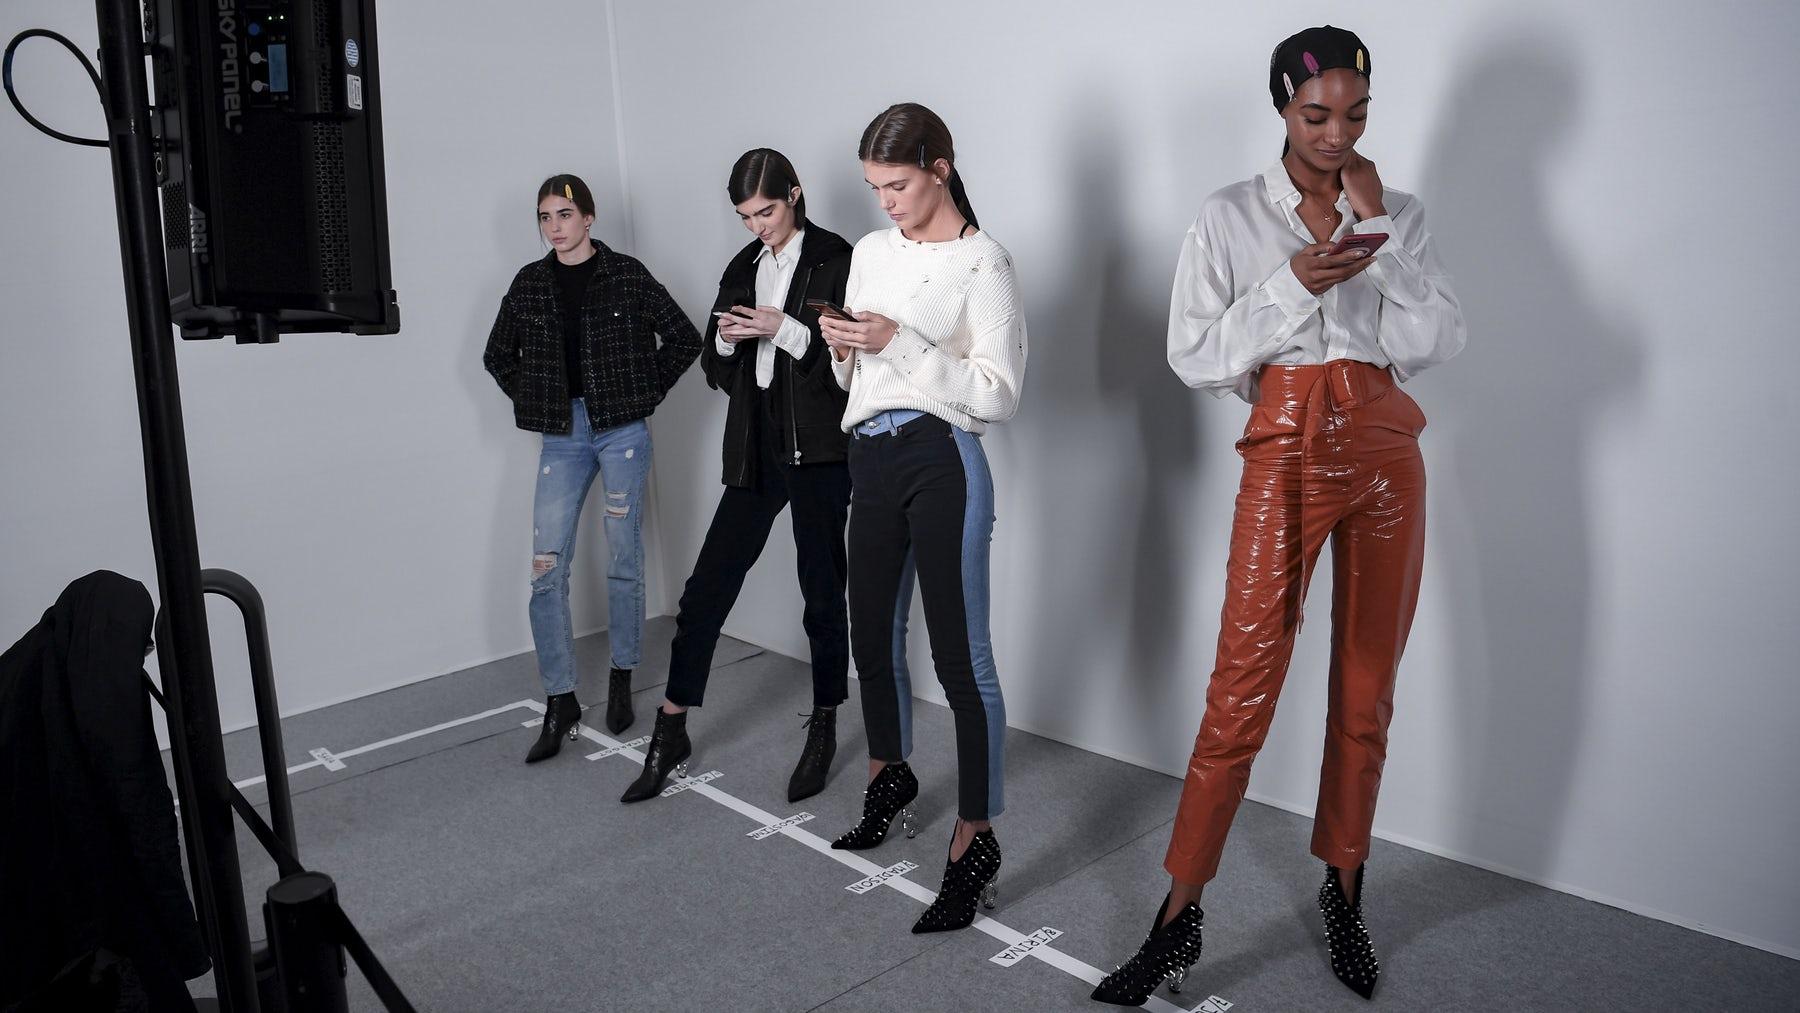 Models wait backstage at Paris Fashion Week Autumn/Winter 2019 | Source: Getty Images